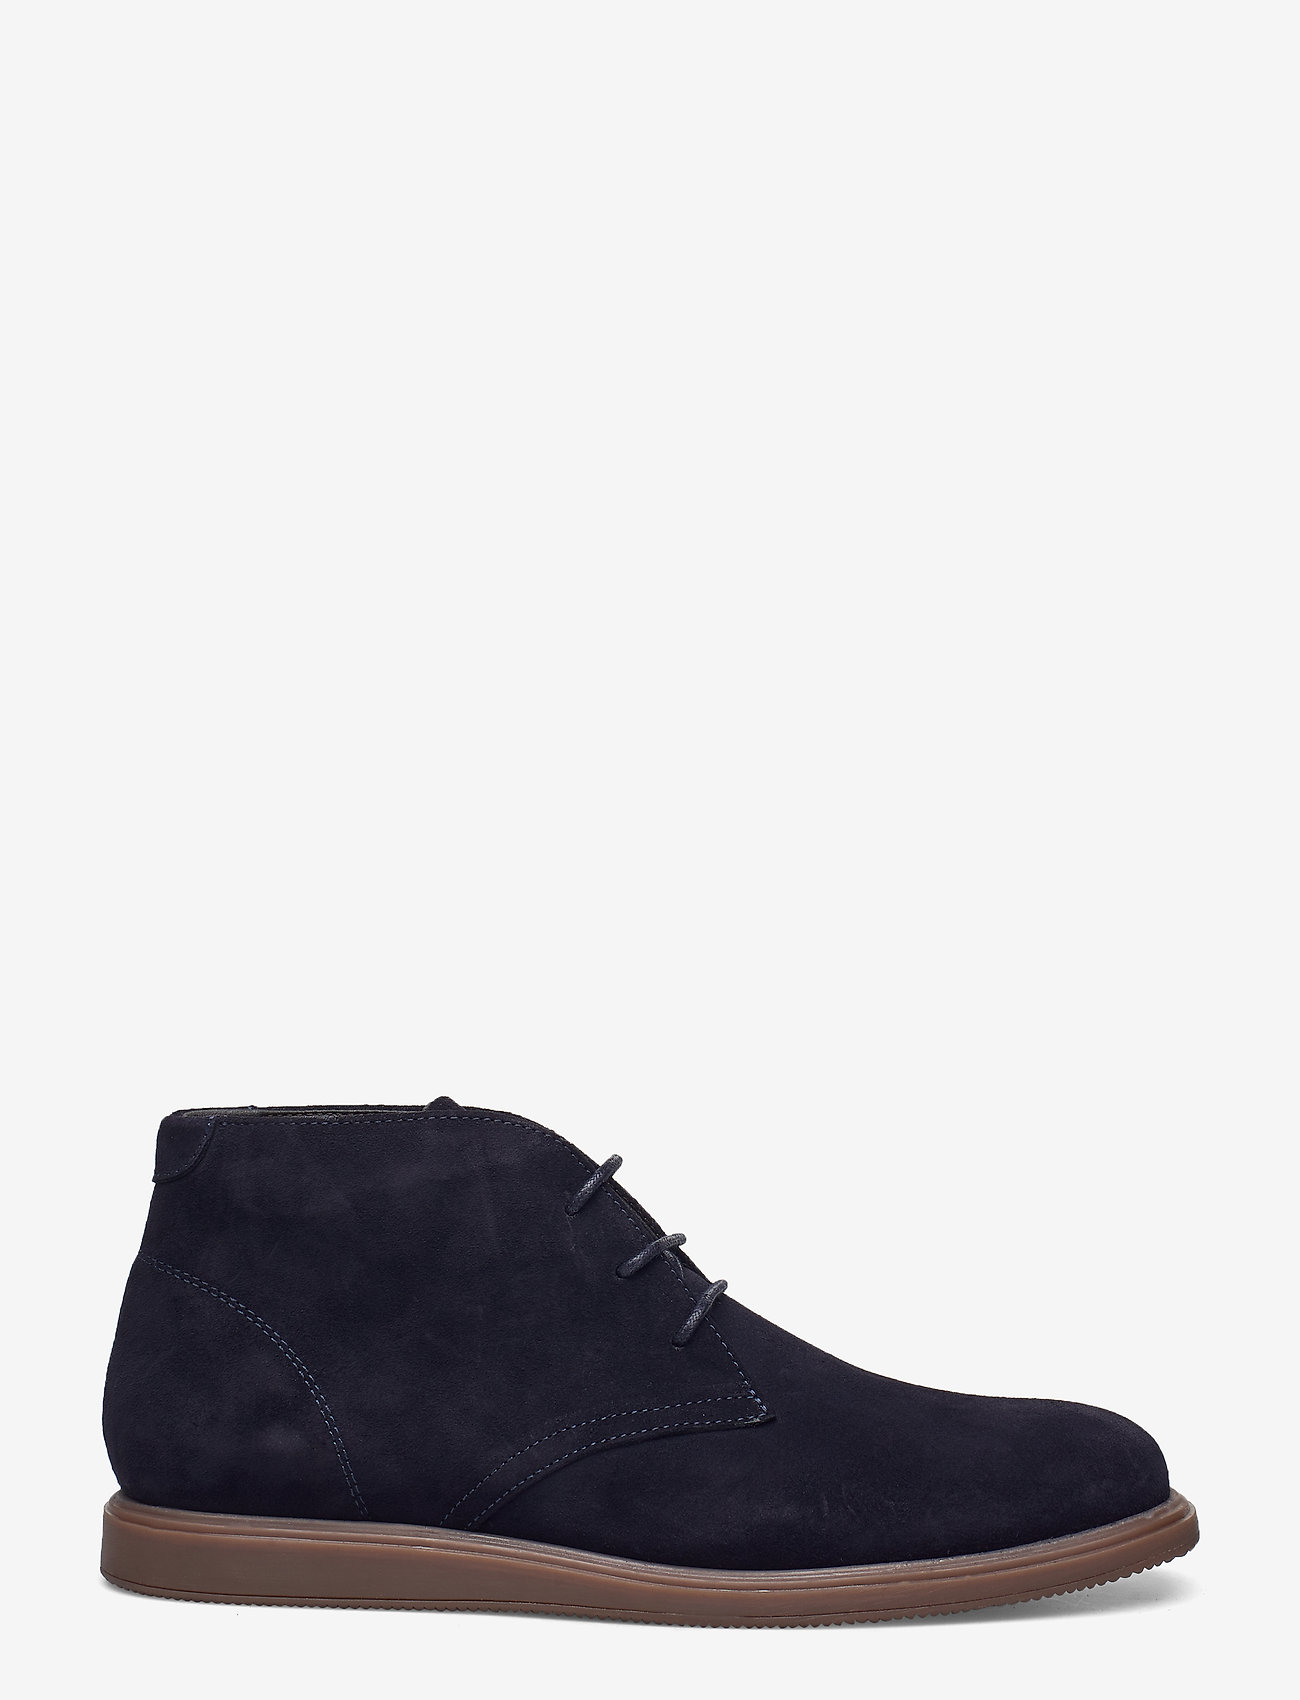 Matinique - MAcke - desert boots - dark navy - 1